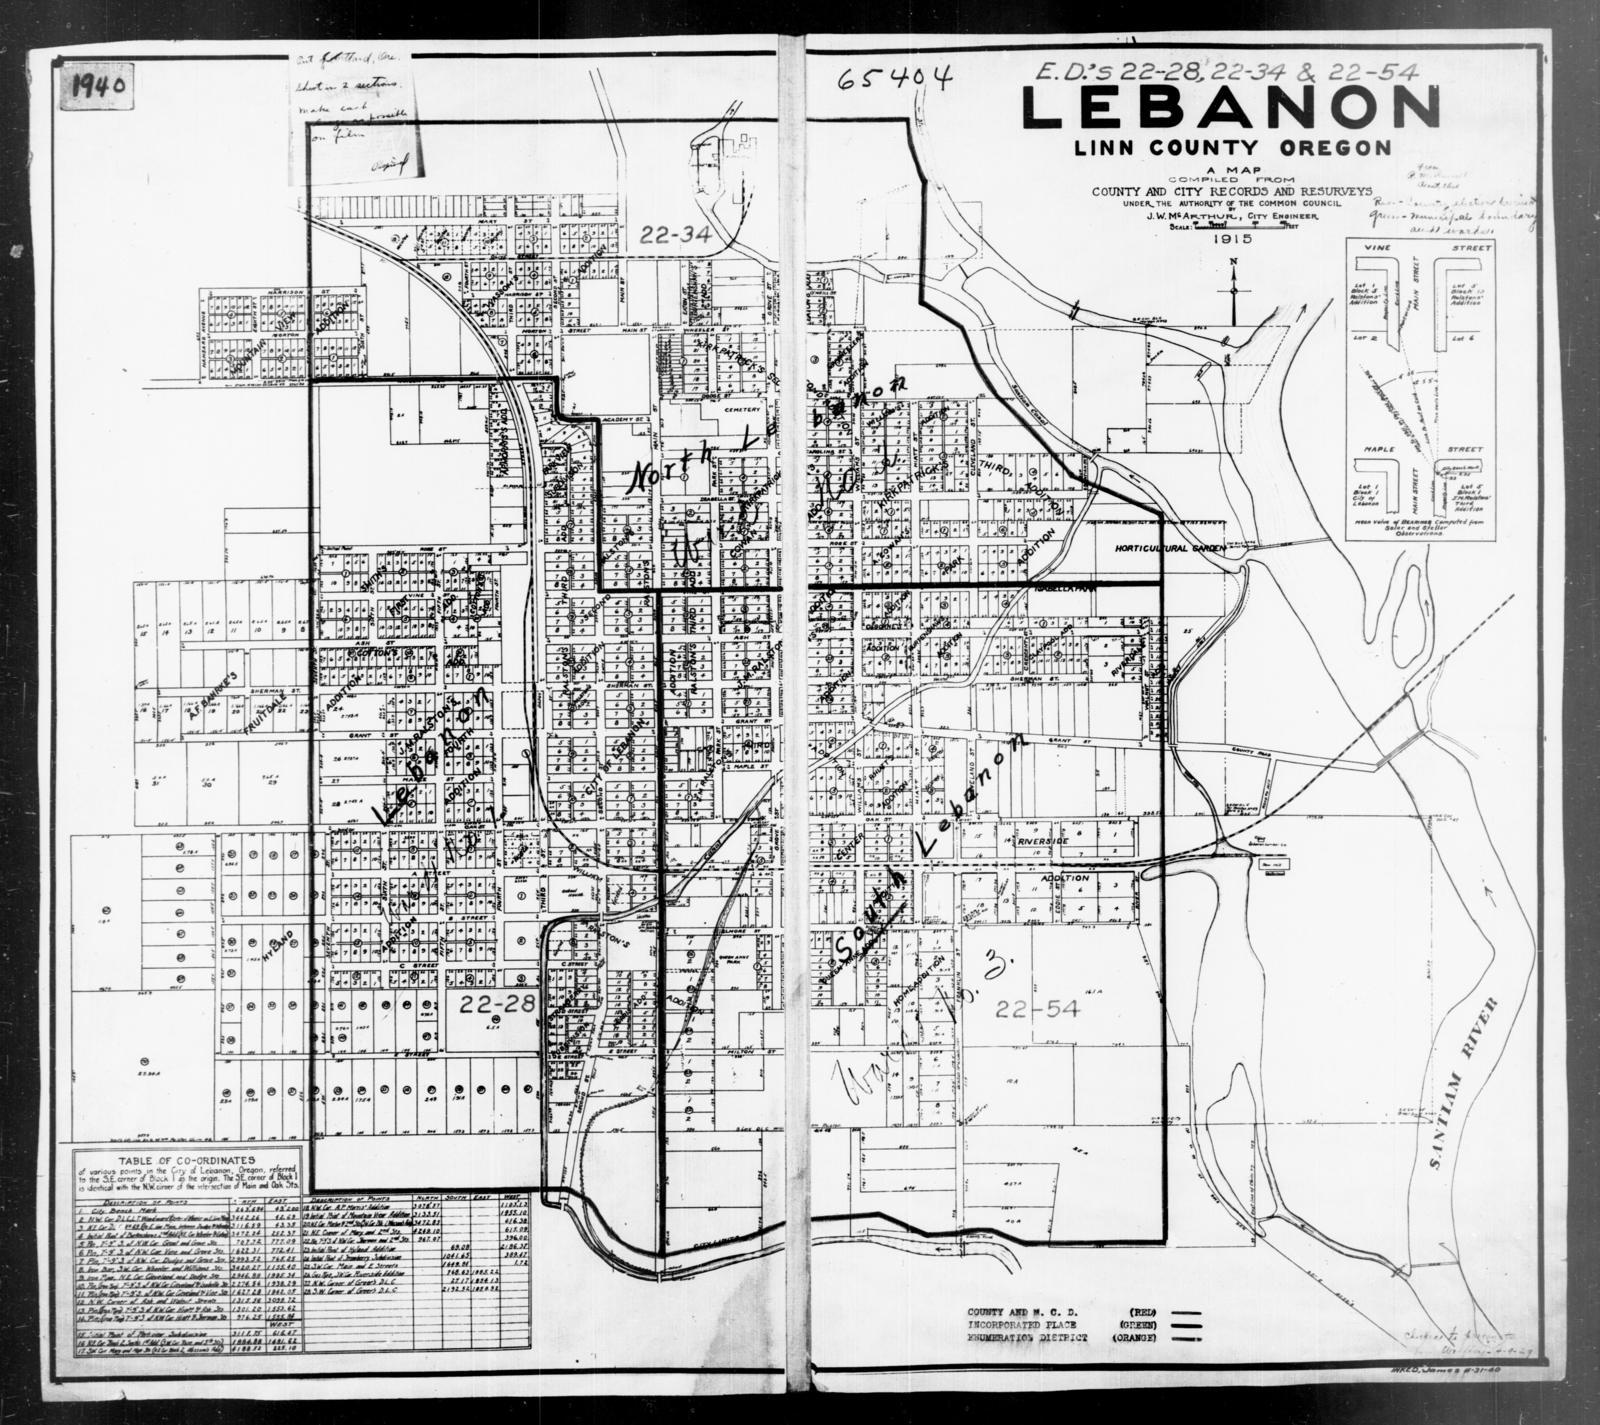 1940 Census Enumeration District Maps Oregon Linn County